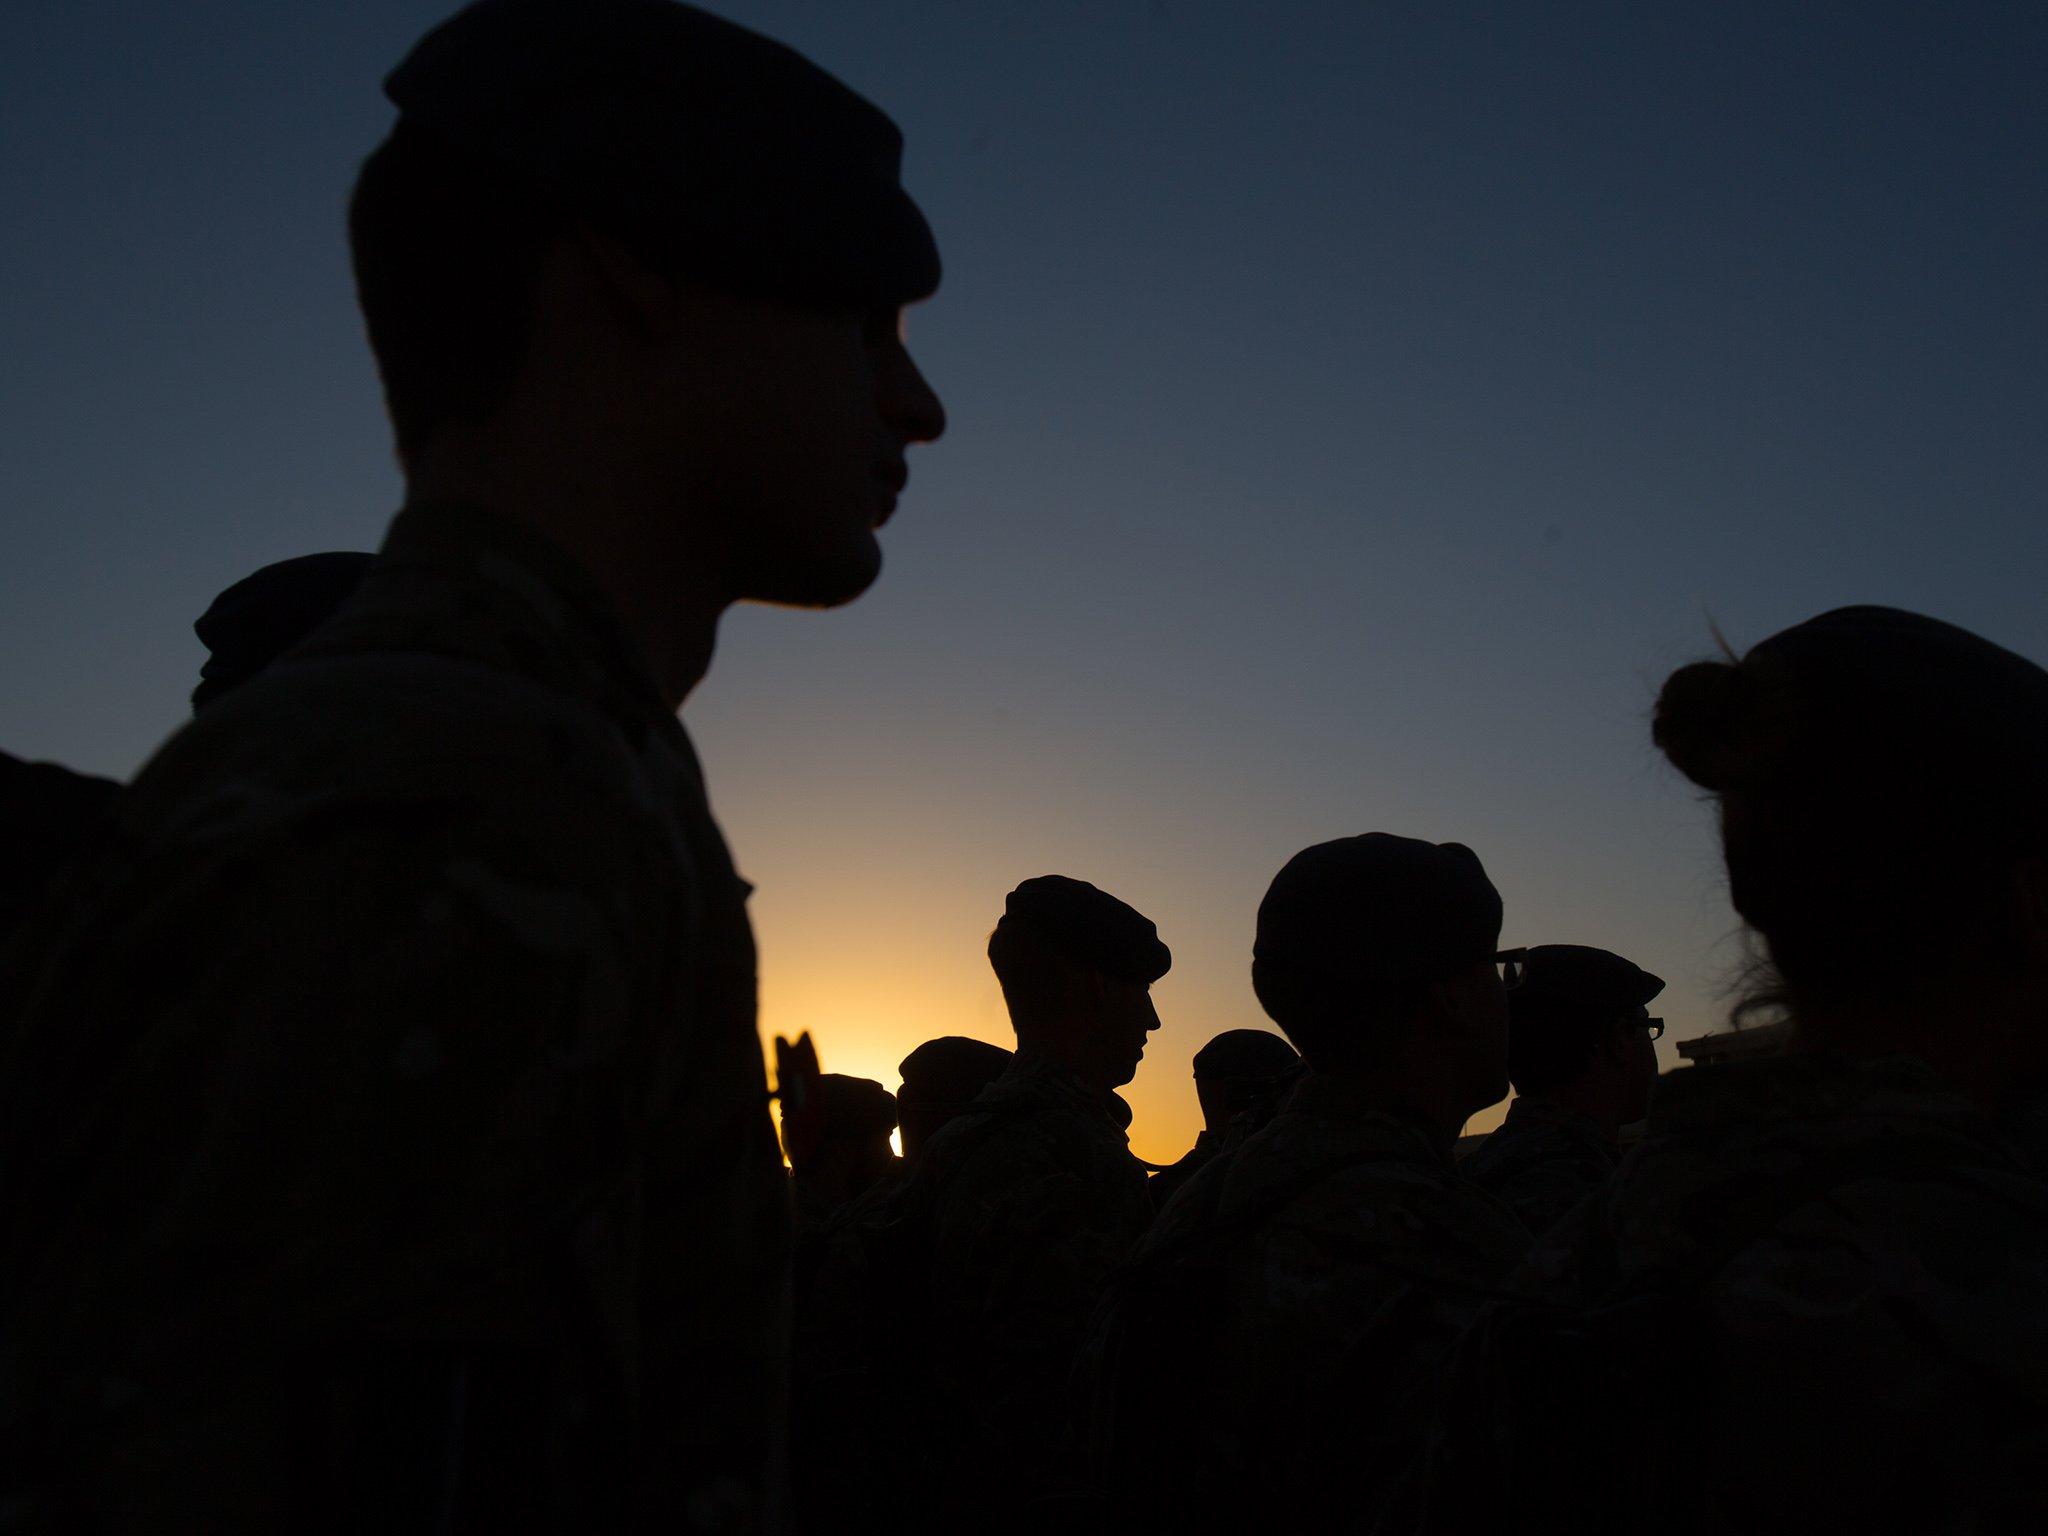 uk-army-mental-health